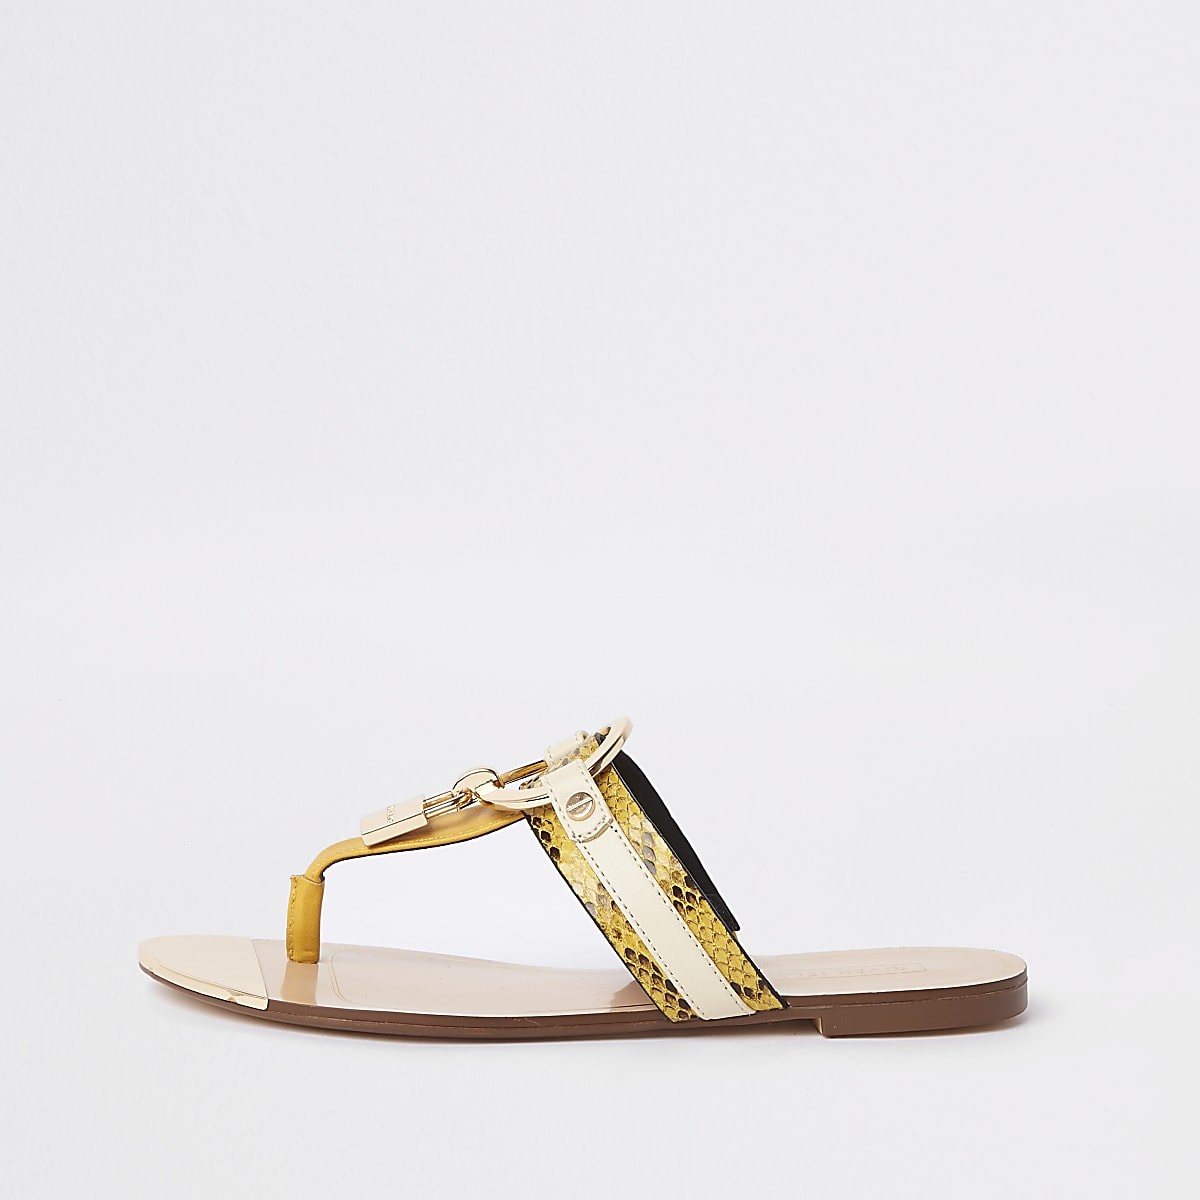 Sandales jaunes à entredoigt avec cadenas